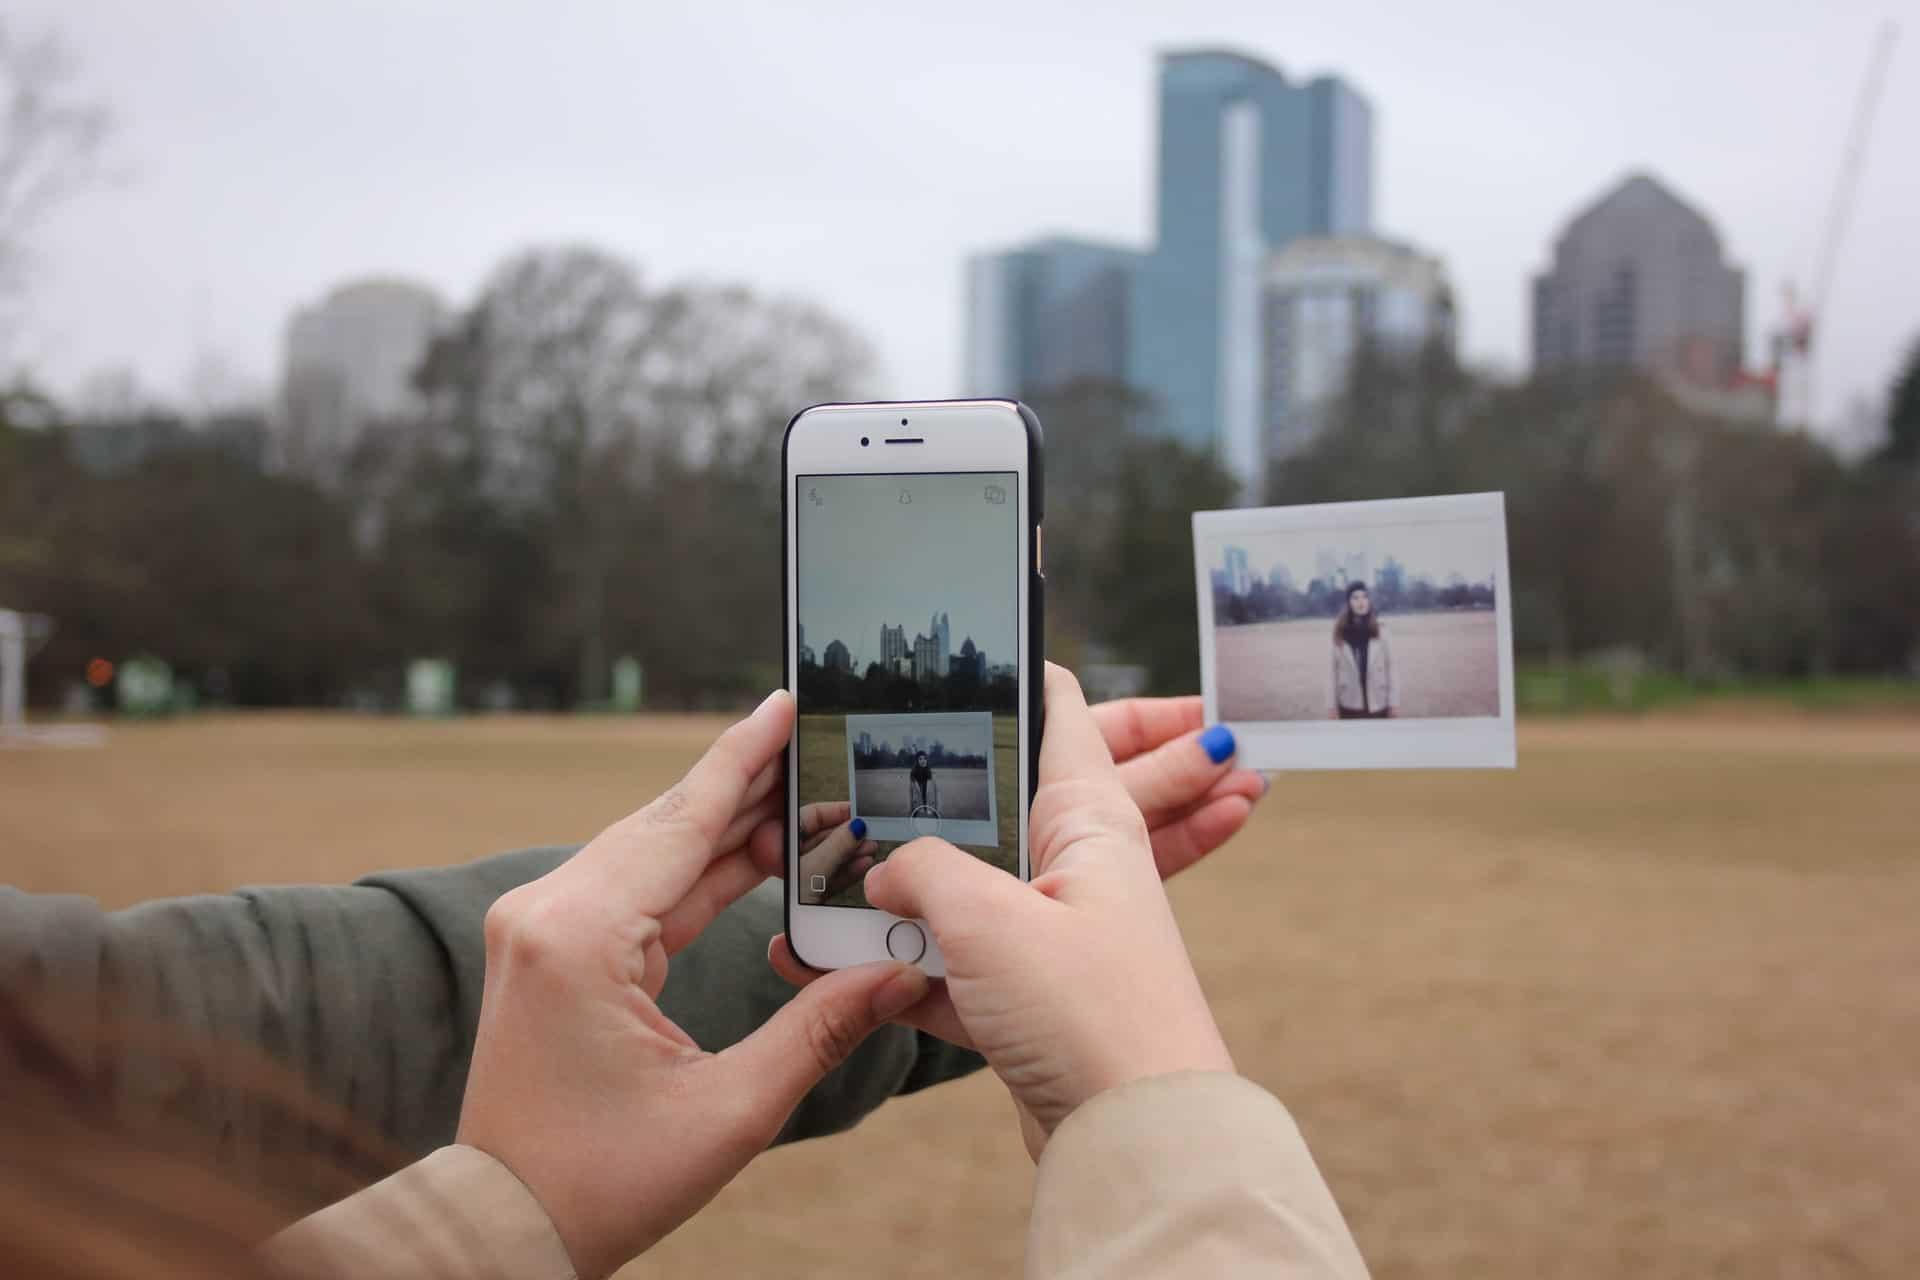 Pix-Star Snap iOS capture photos inside app